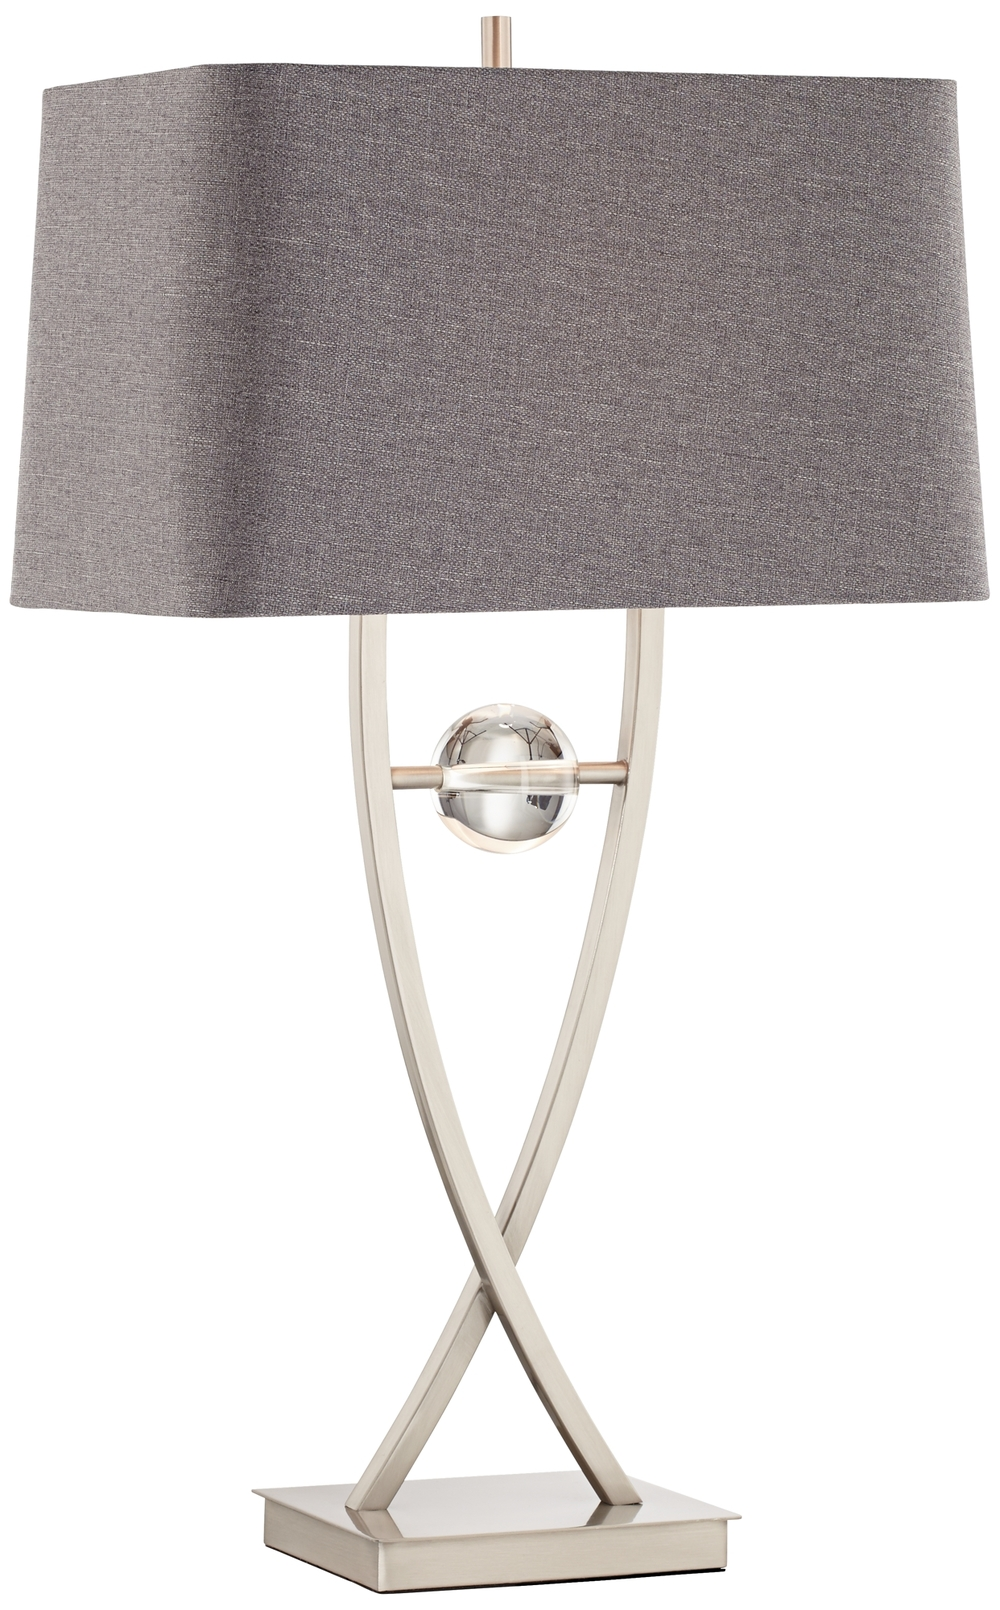 Pacific Coast Lighting - Wishbone Table Lamp